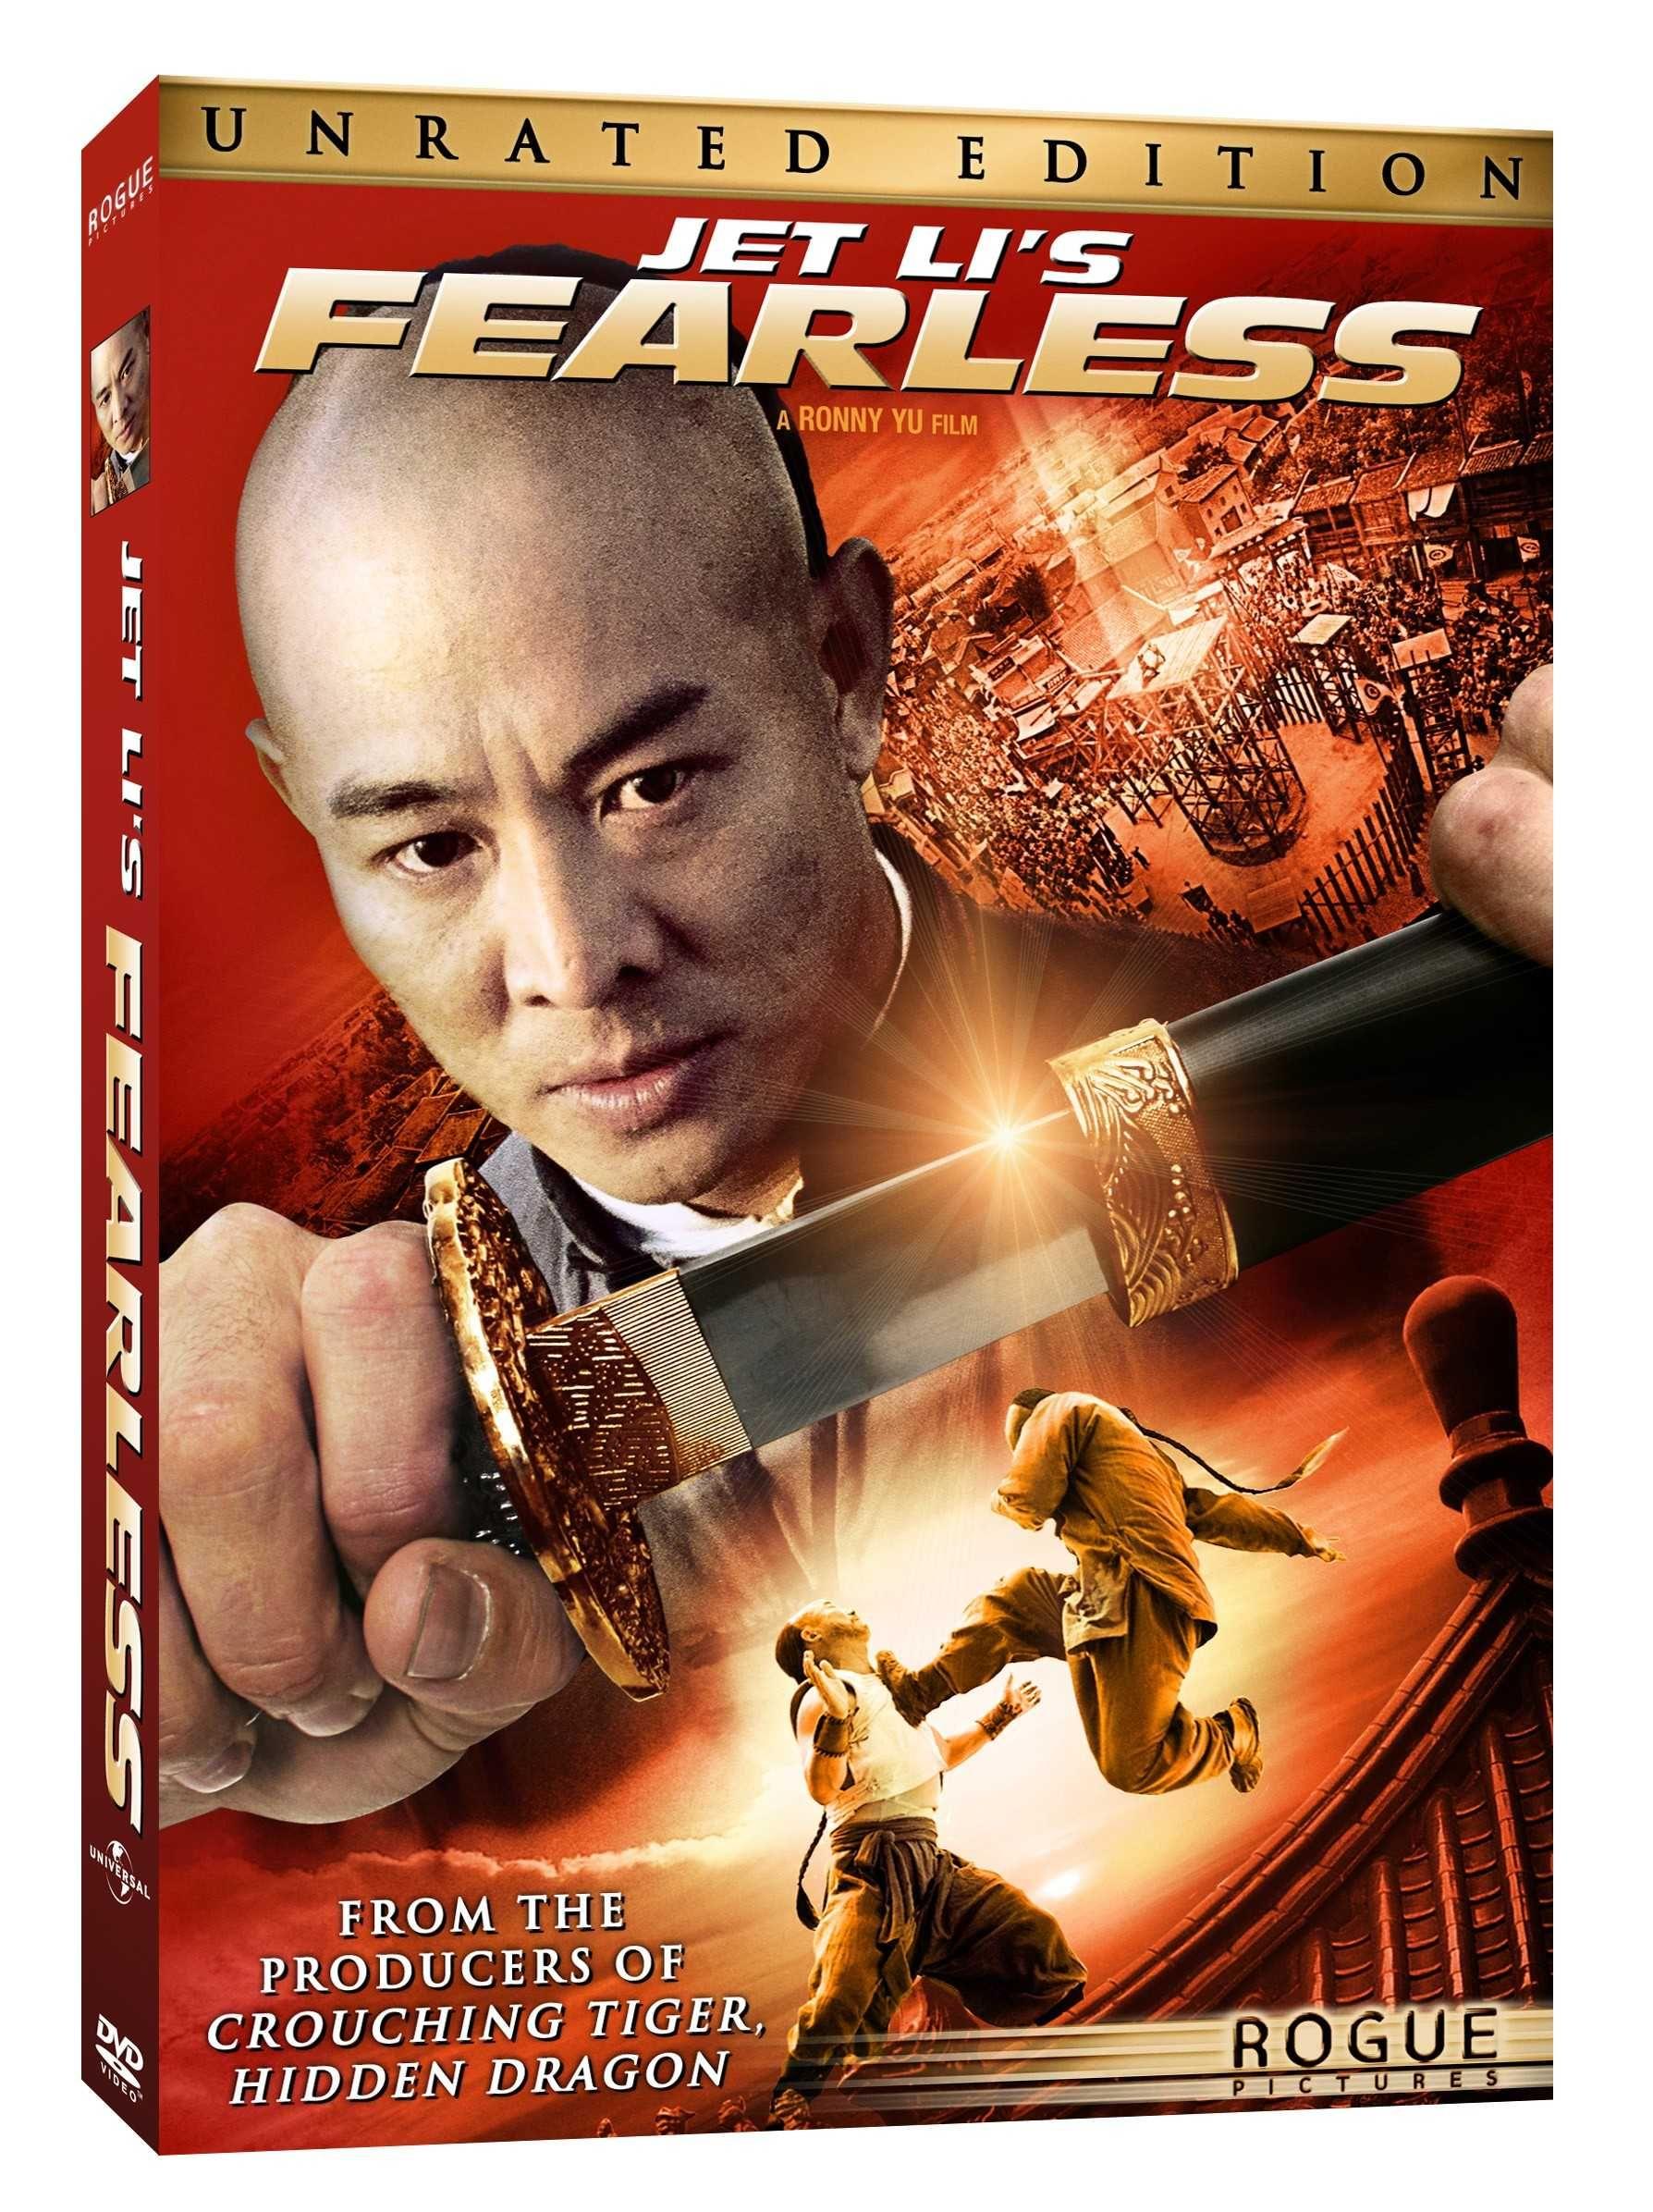 jet li 39 s fearless 2006 jet li chinese kung fu movies pinterest kung. Black Bedroom Furniture Sets. Home Design Ideas